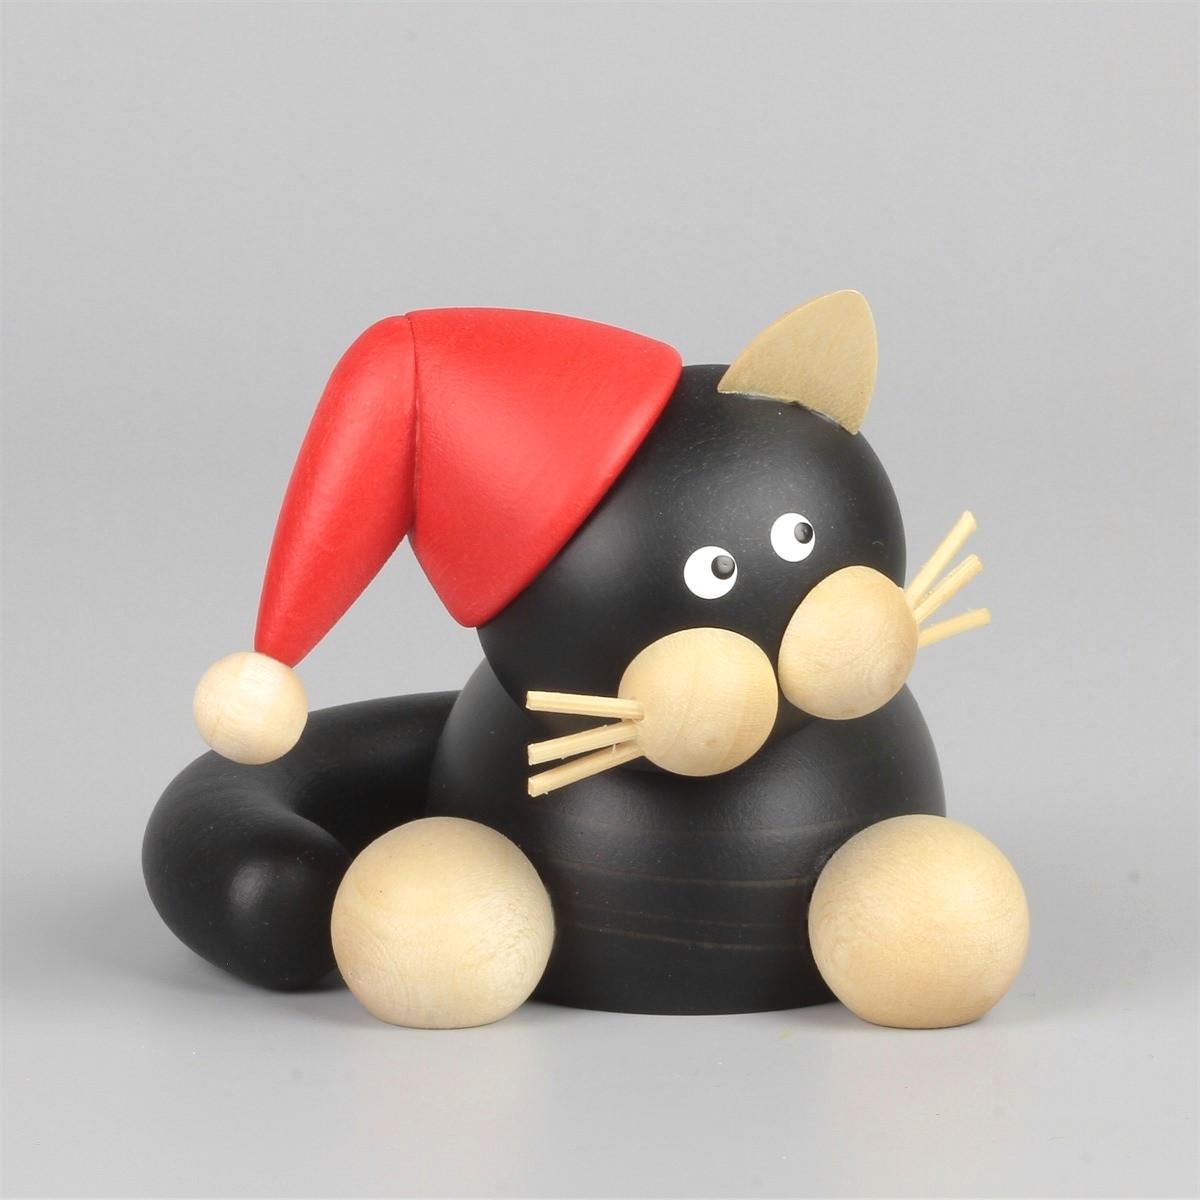 weihnachts schmusekater sammy erzgebirgskunst drechsel. Black Bedroom Furniture Sets. Home Design Ideas